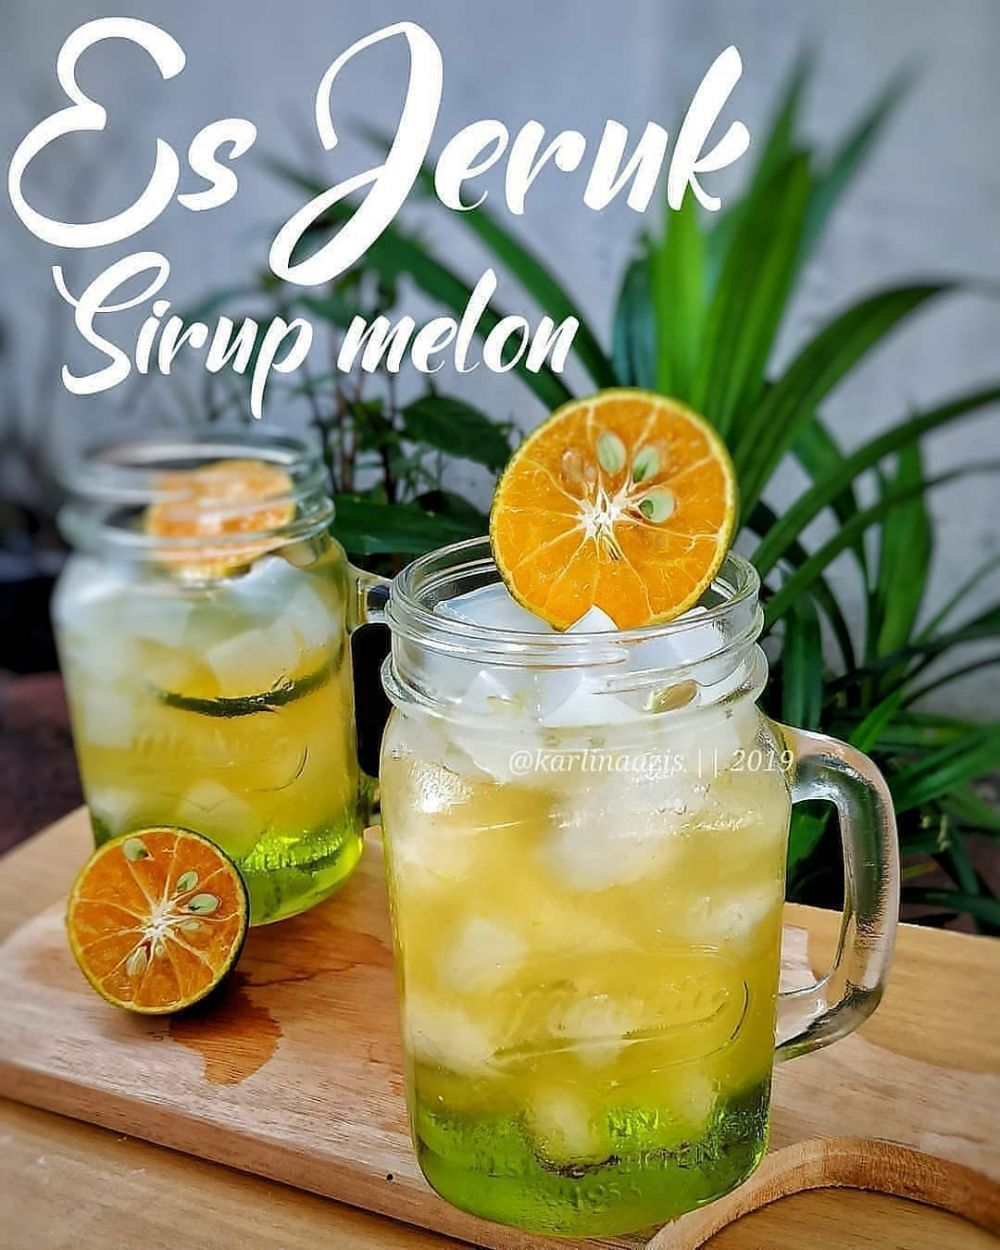 Resep Minuman Untuk Dijual Instagram Resep Minuman Minuman Resep